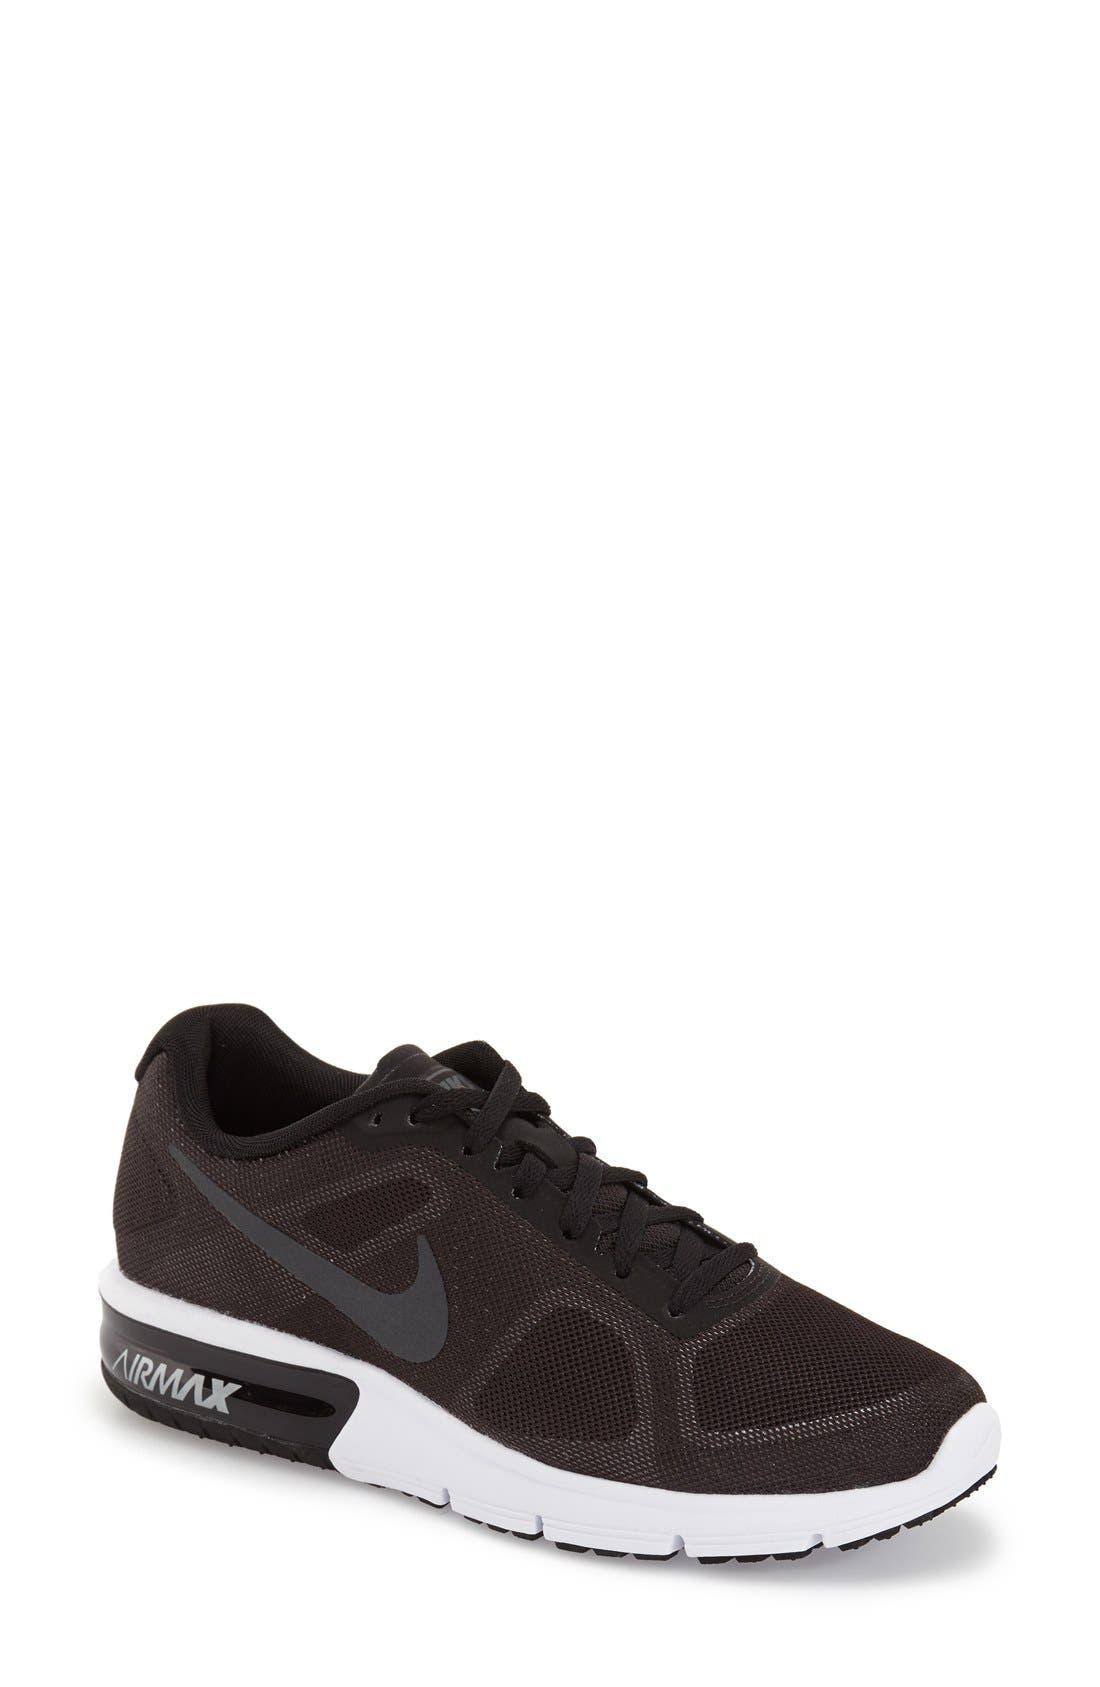 Main Image - Nike 'Air Max Sequent' Running Shoe (Women)